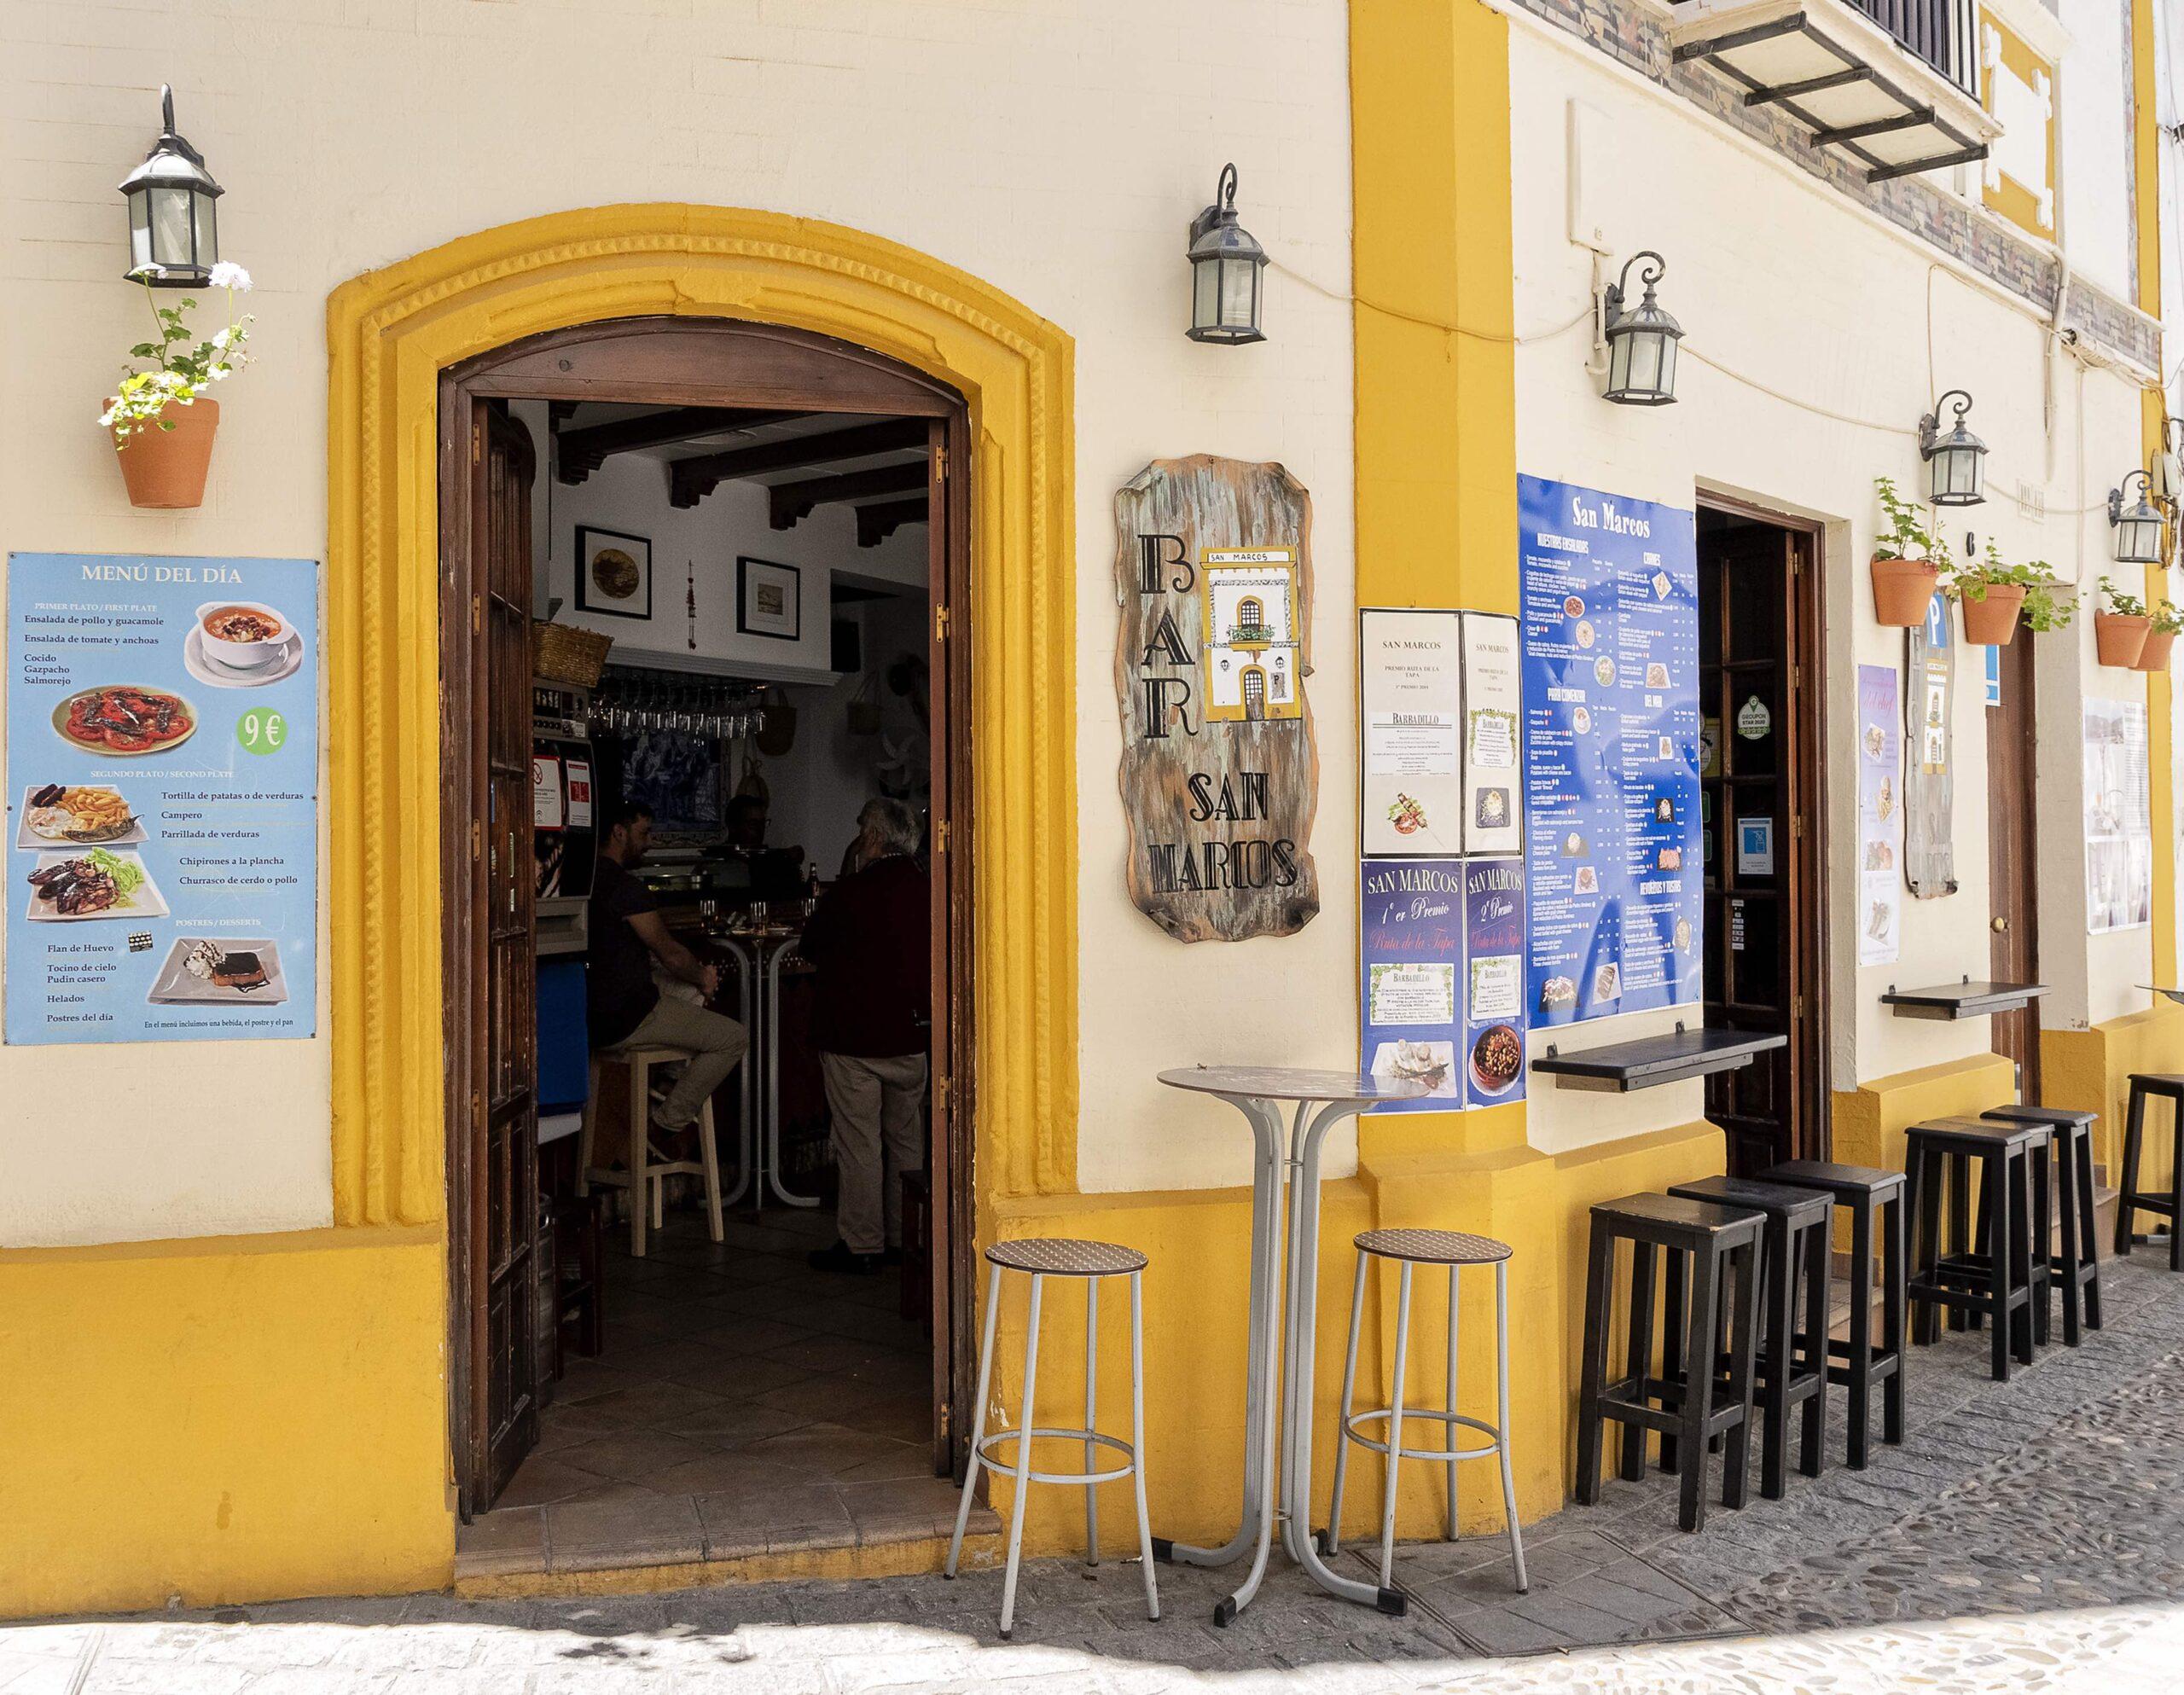 Bar San Marcos